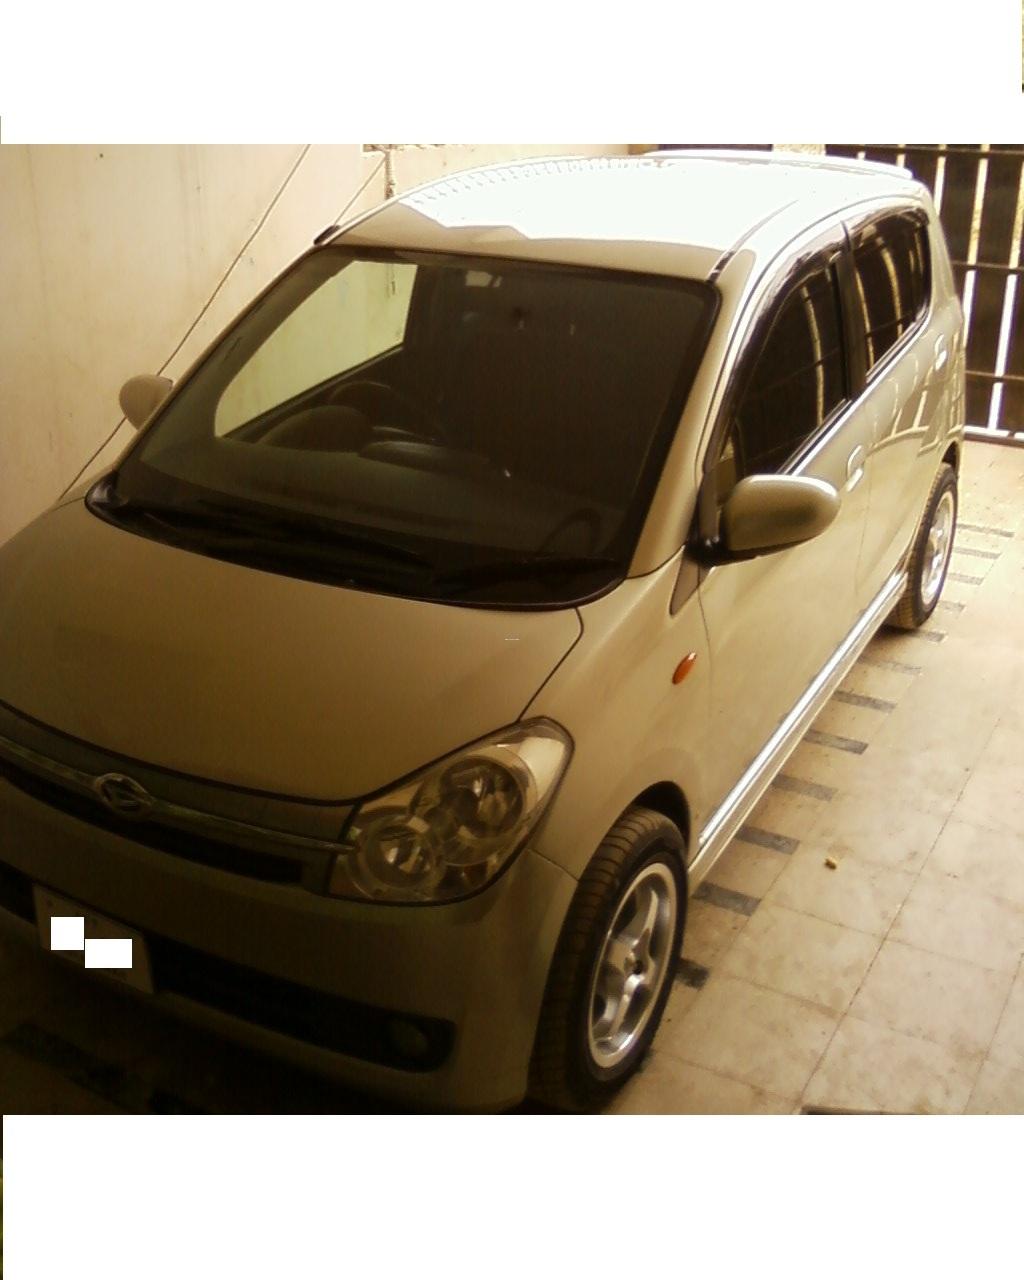 Used Daihatsu Mira 2007 Car For Sale In Islamabad